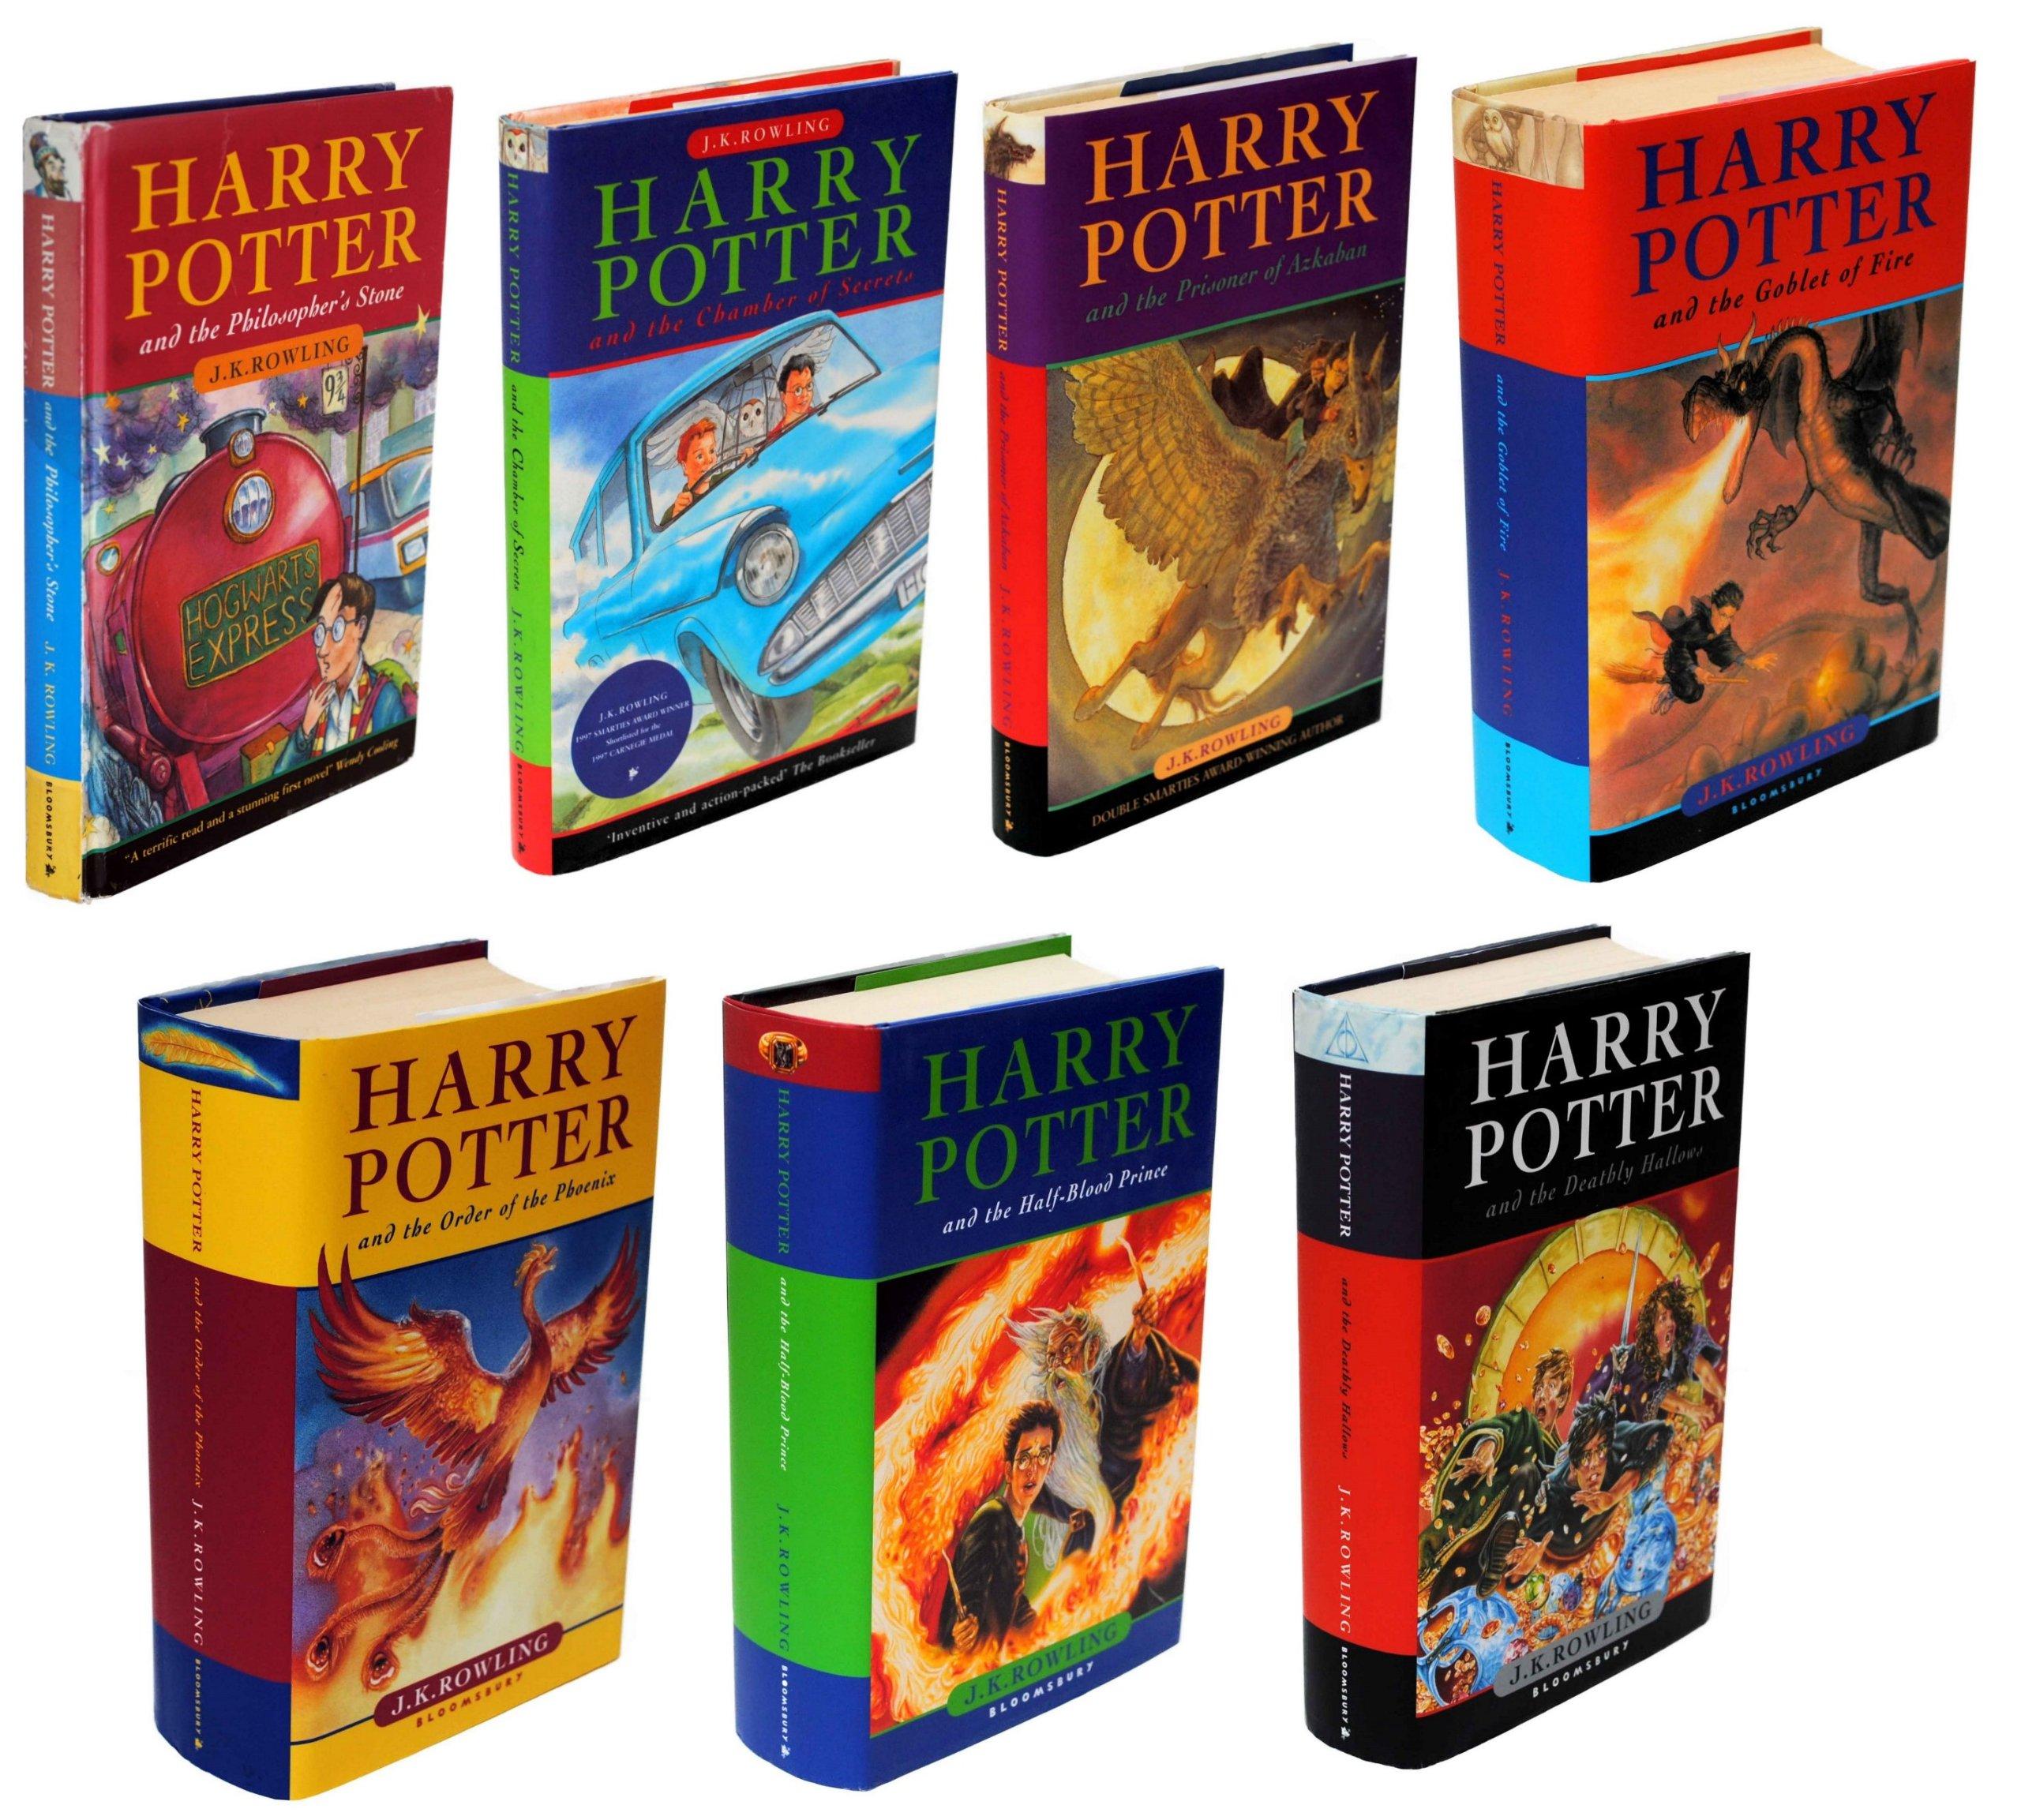 Harry Potter Book Cover Uk ~ Harry potter and the prisoner of azkaban amazon books